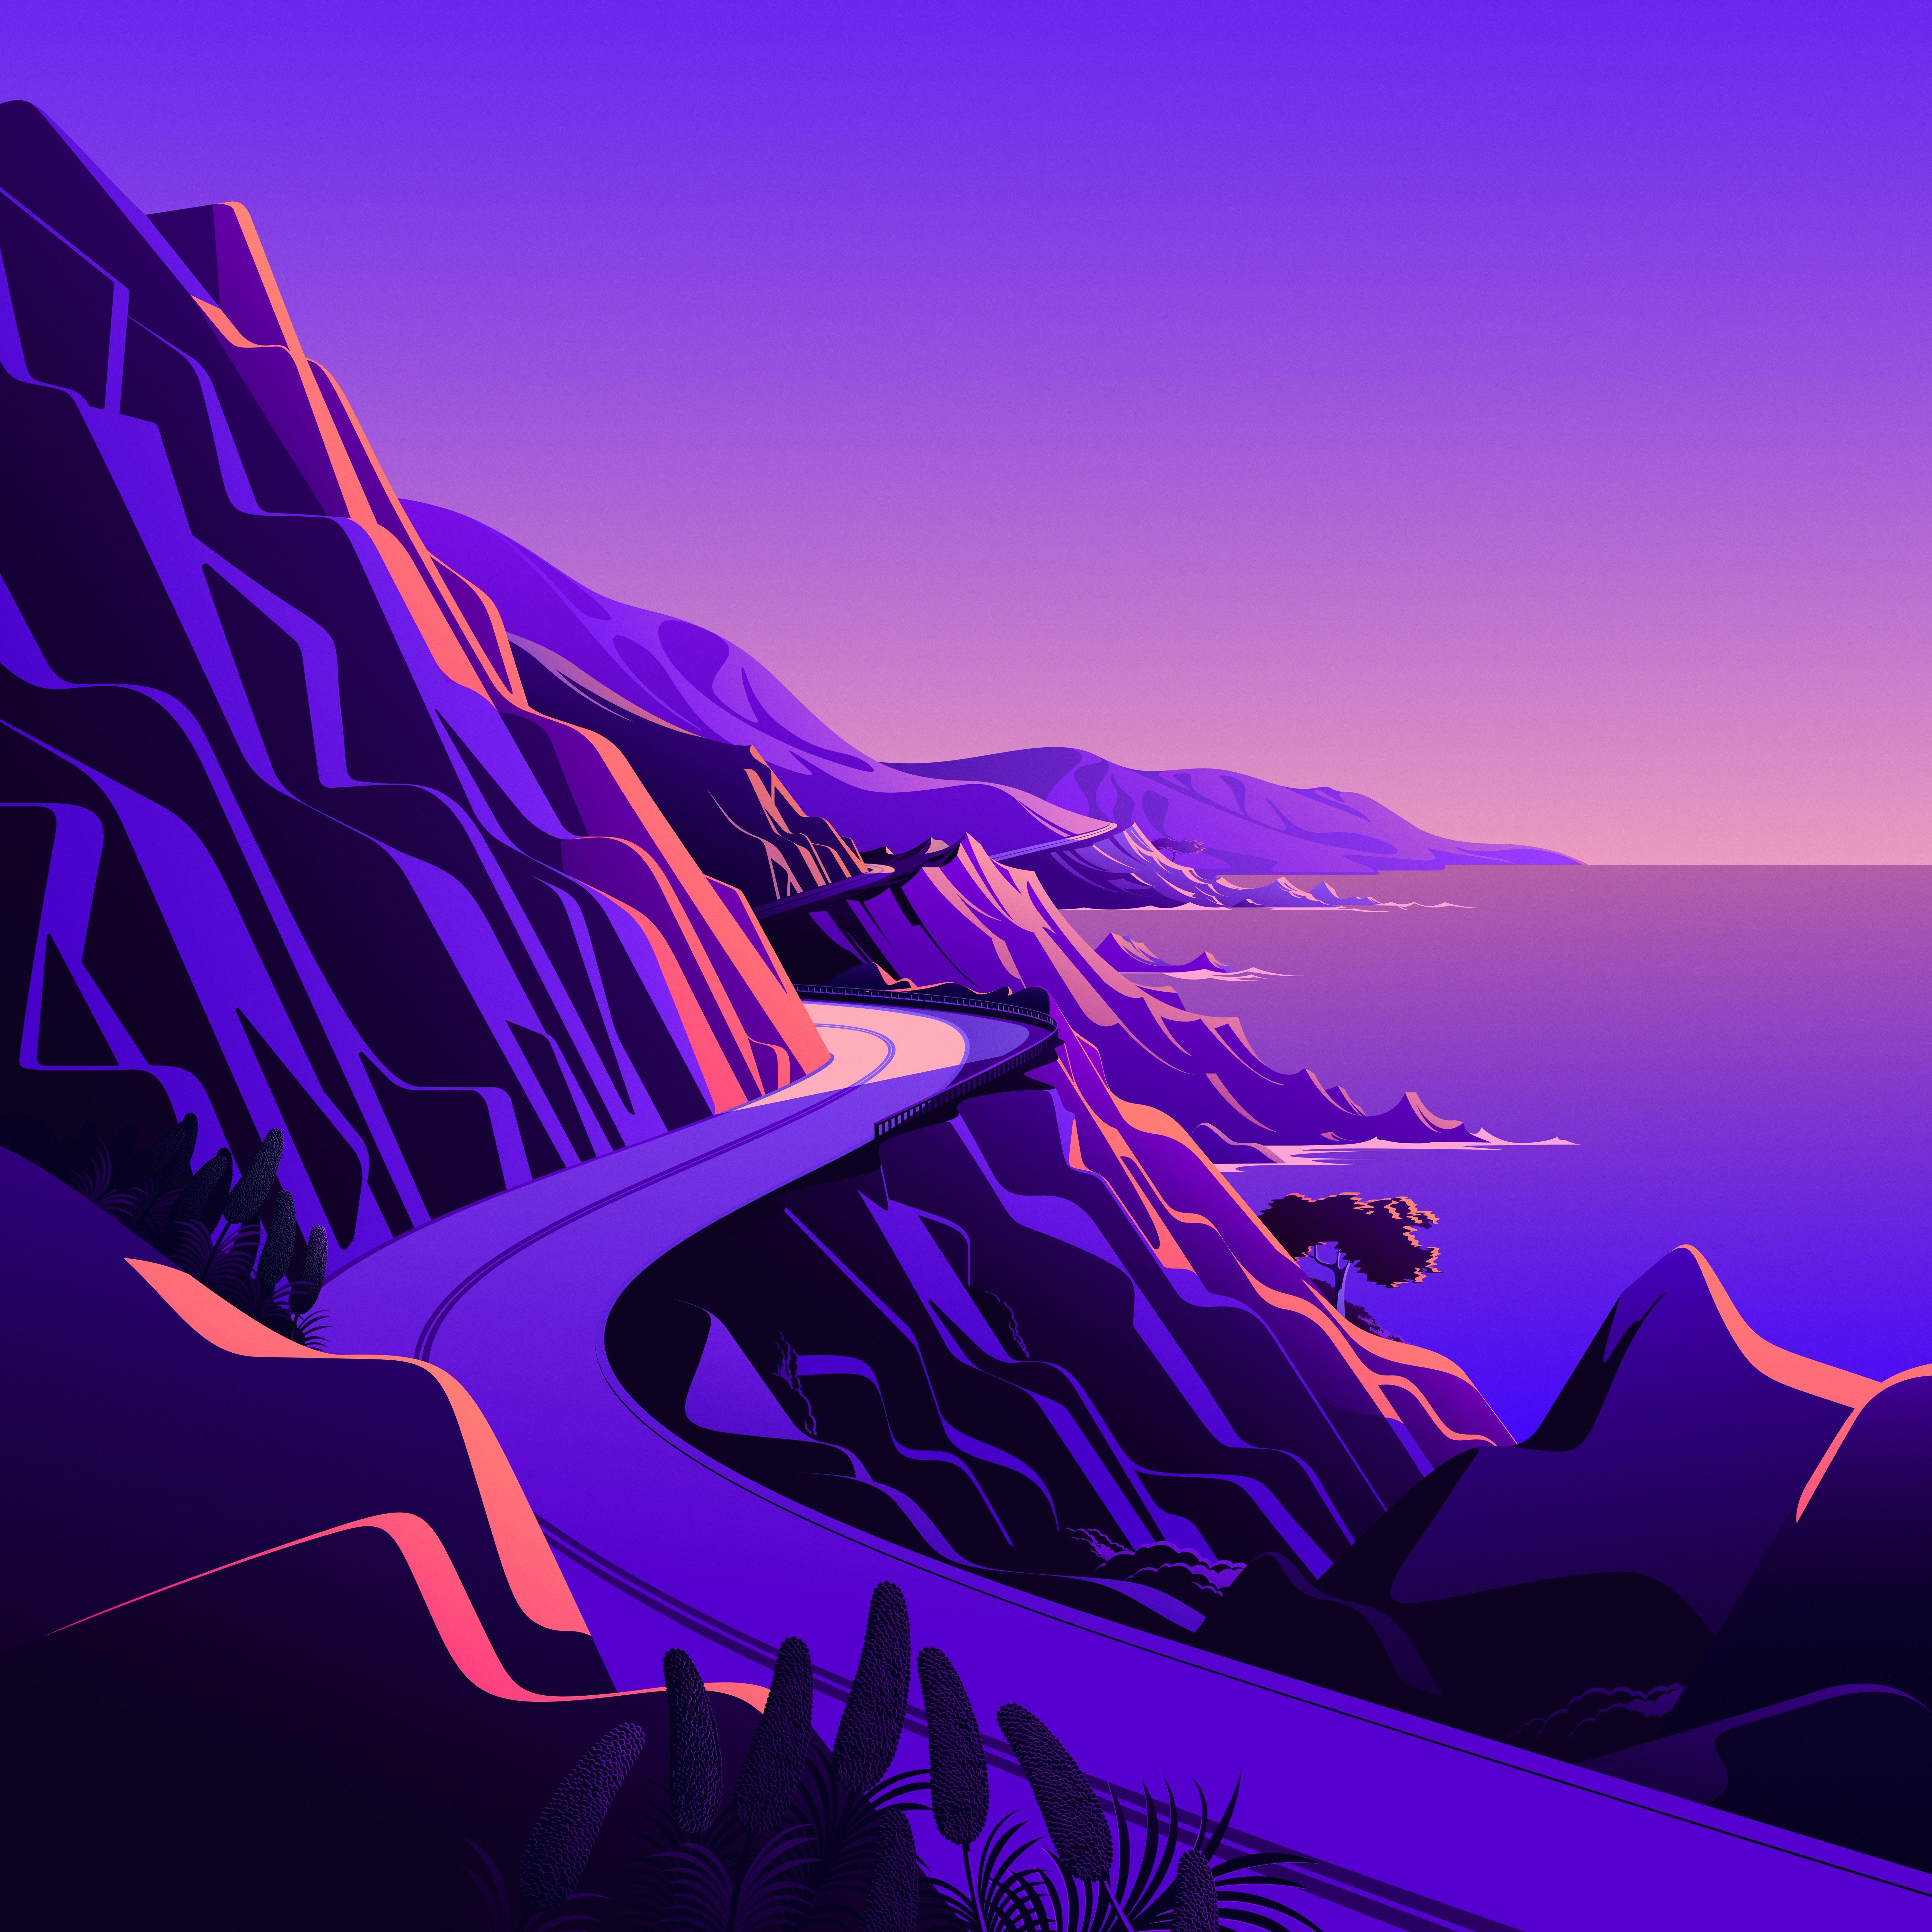 macOS Big Sur The Cliffs 4 dragged